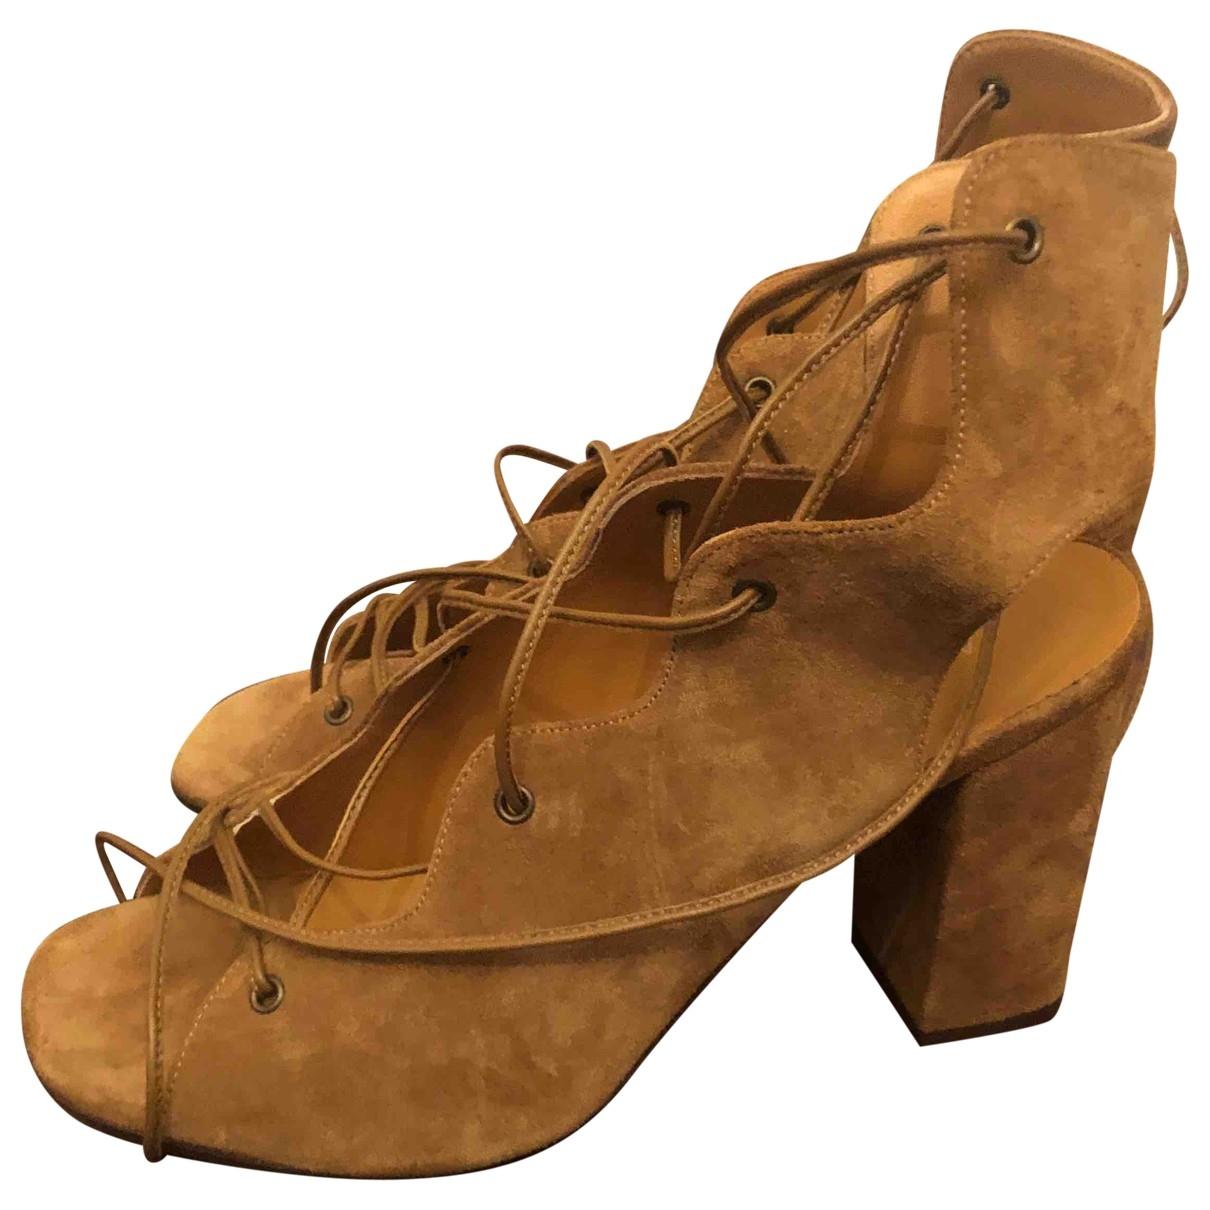 Saint Laurent \N Brown Suede Sandals for Women 38 EU